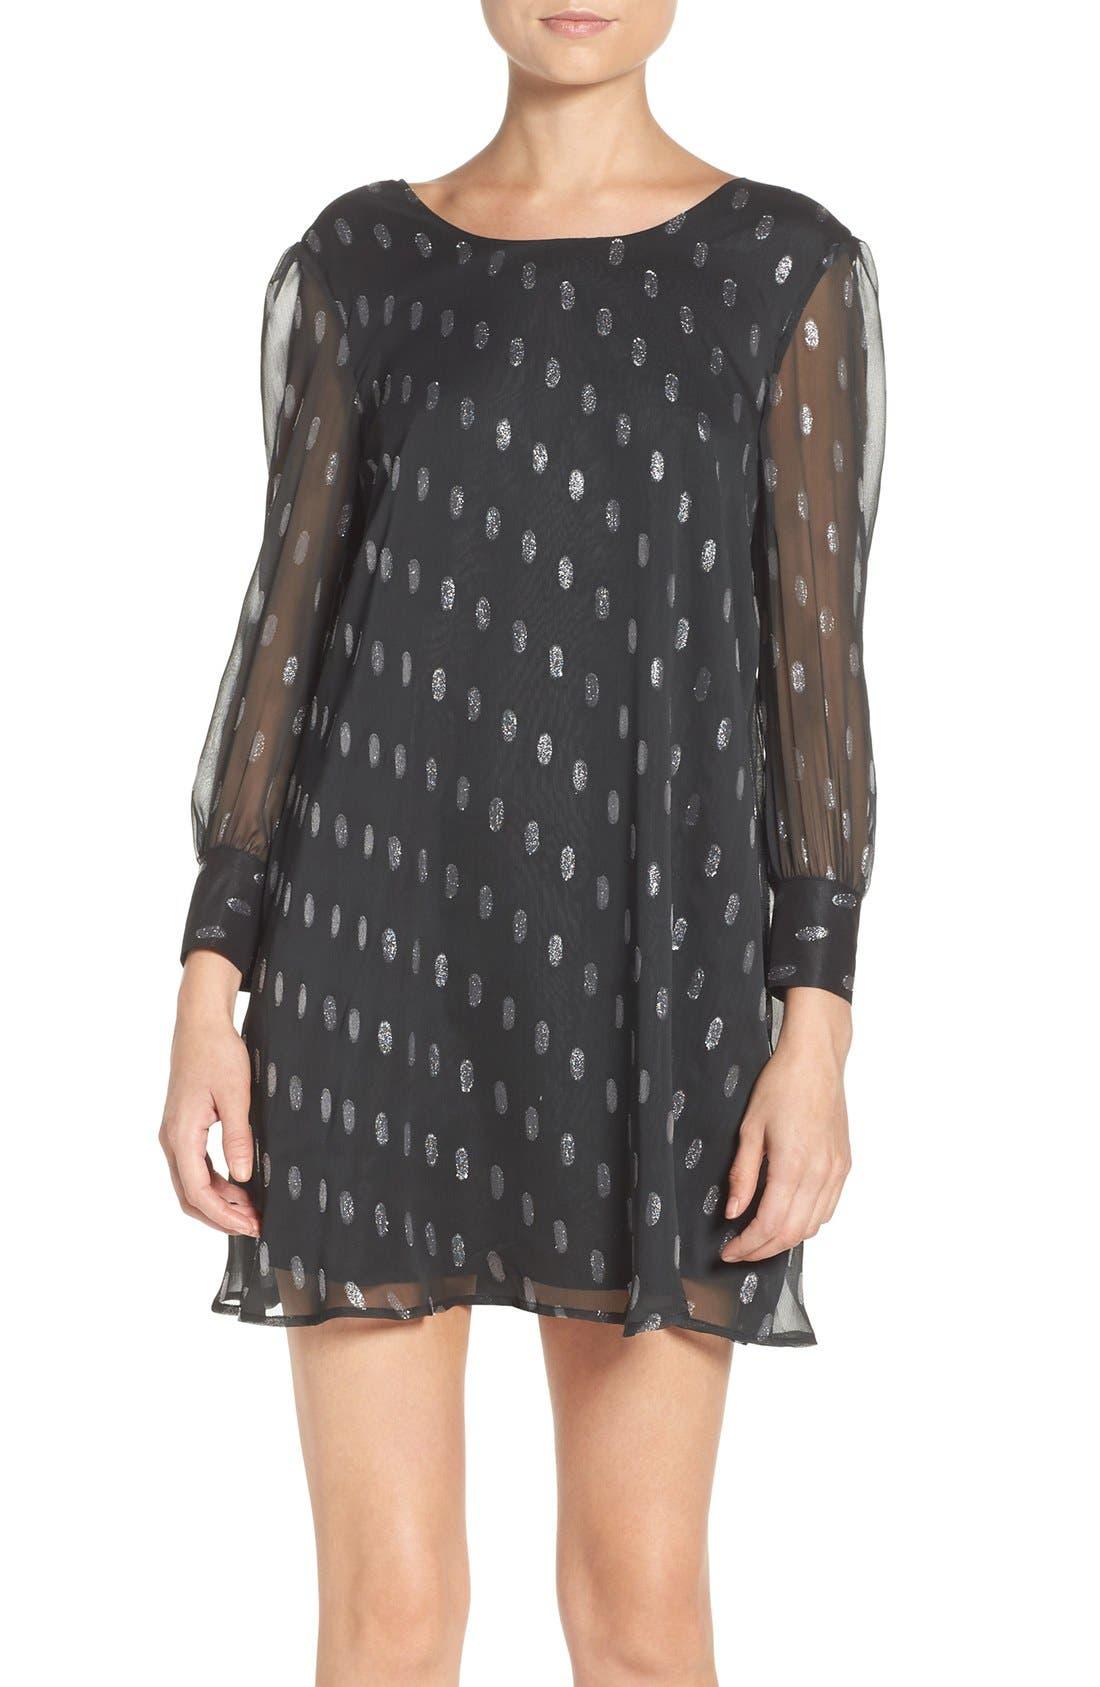 Alternate Image 1 Selected - BB Dakota Warren Metallic Chiffon Shift Dress